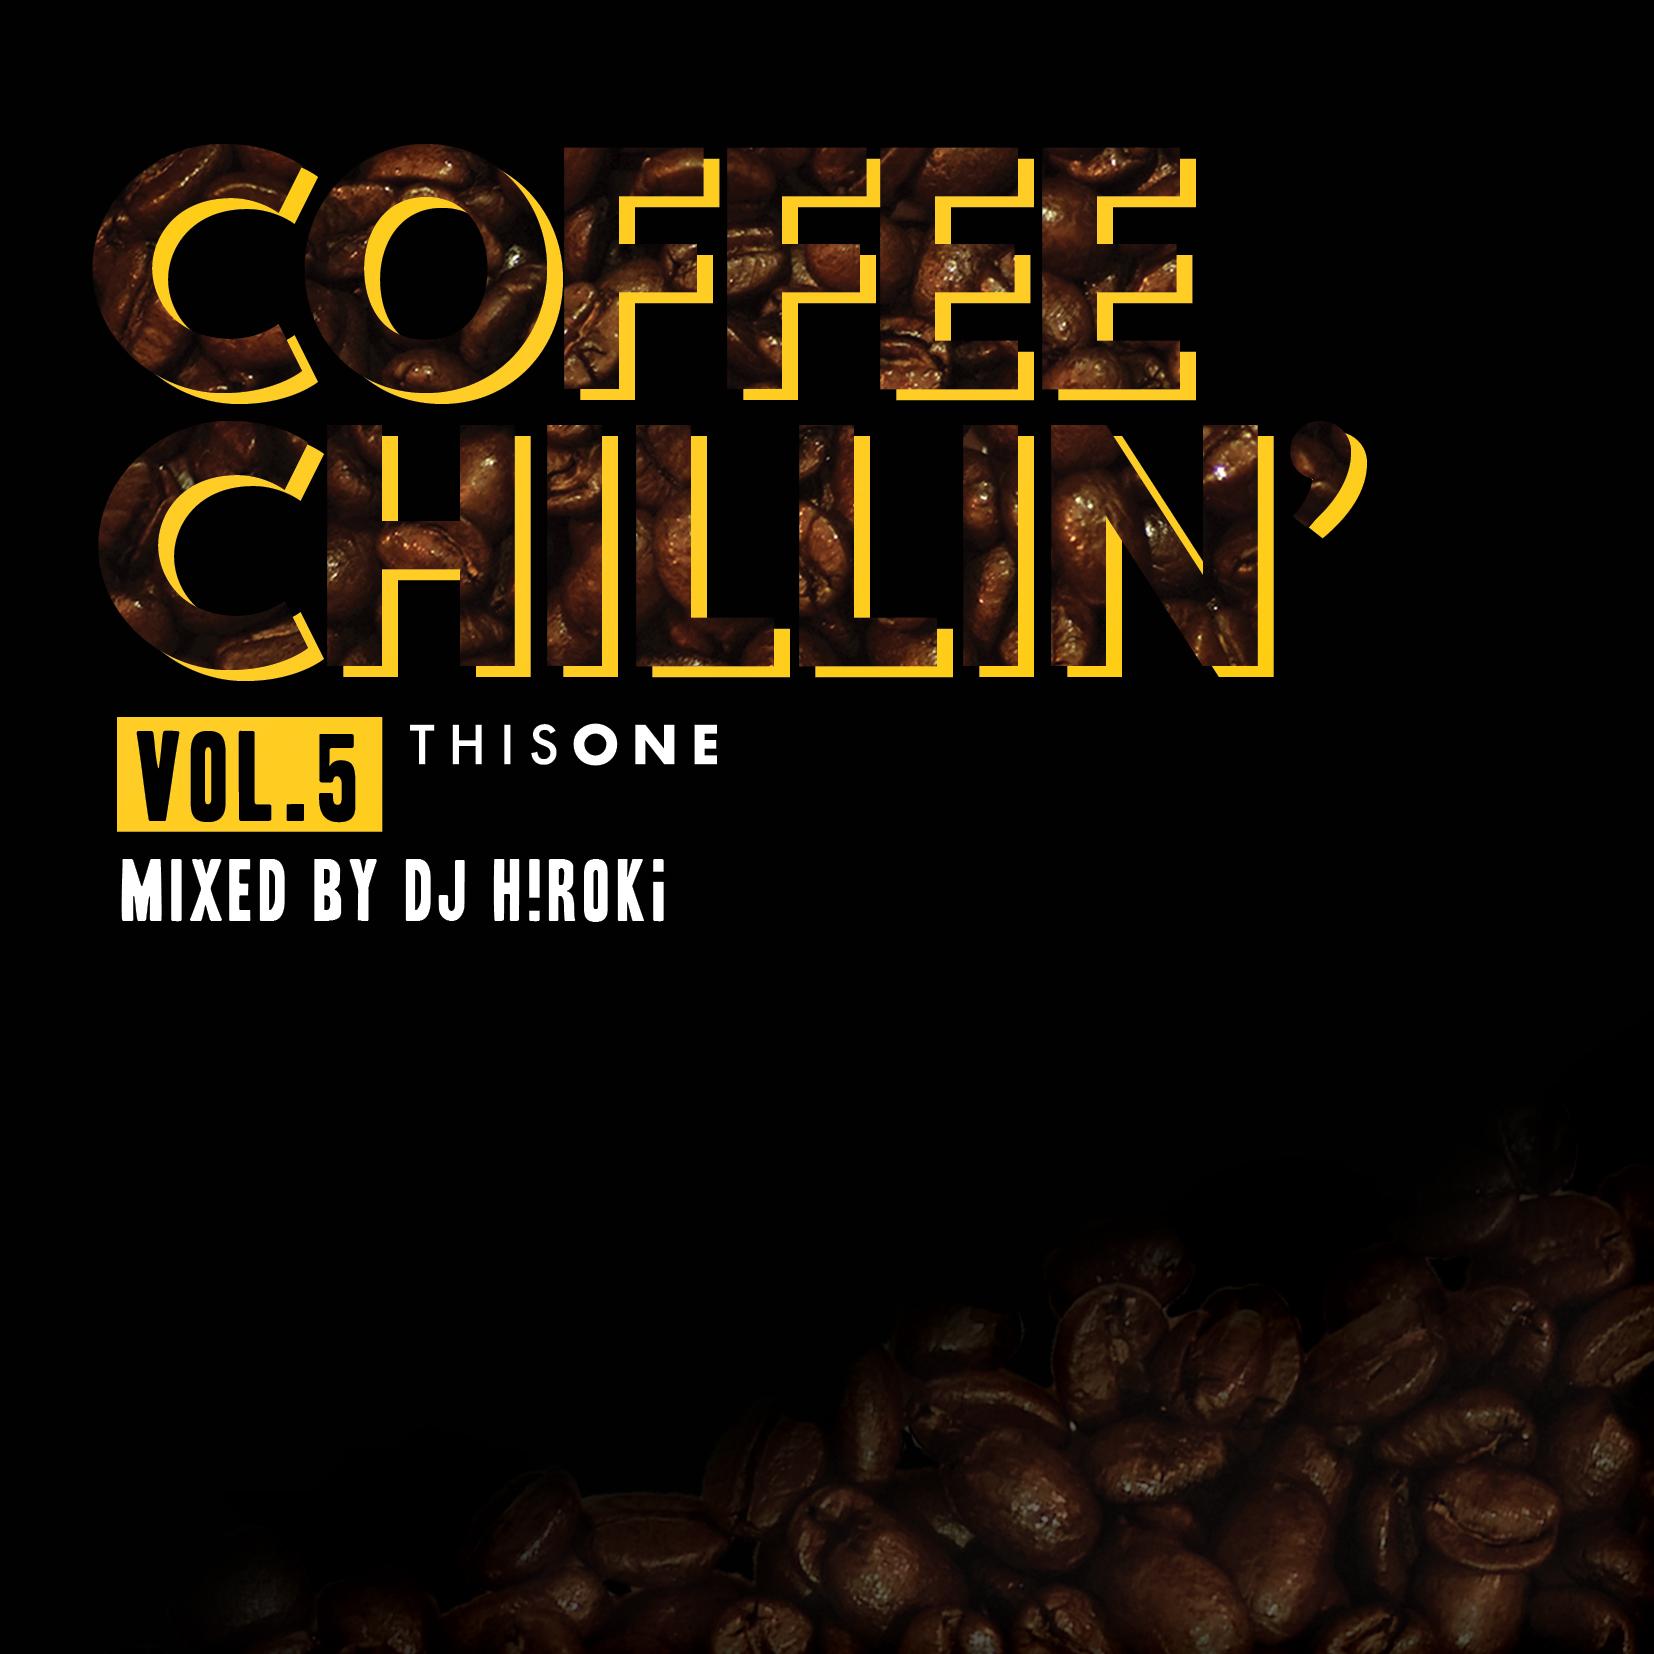 [MIX CD] DJ H!ROKi / COFFEE CHILLIN' -vol.5-